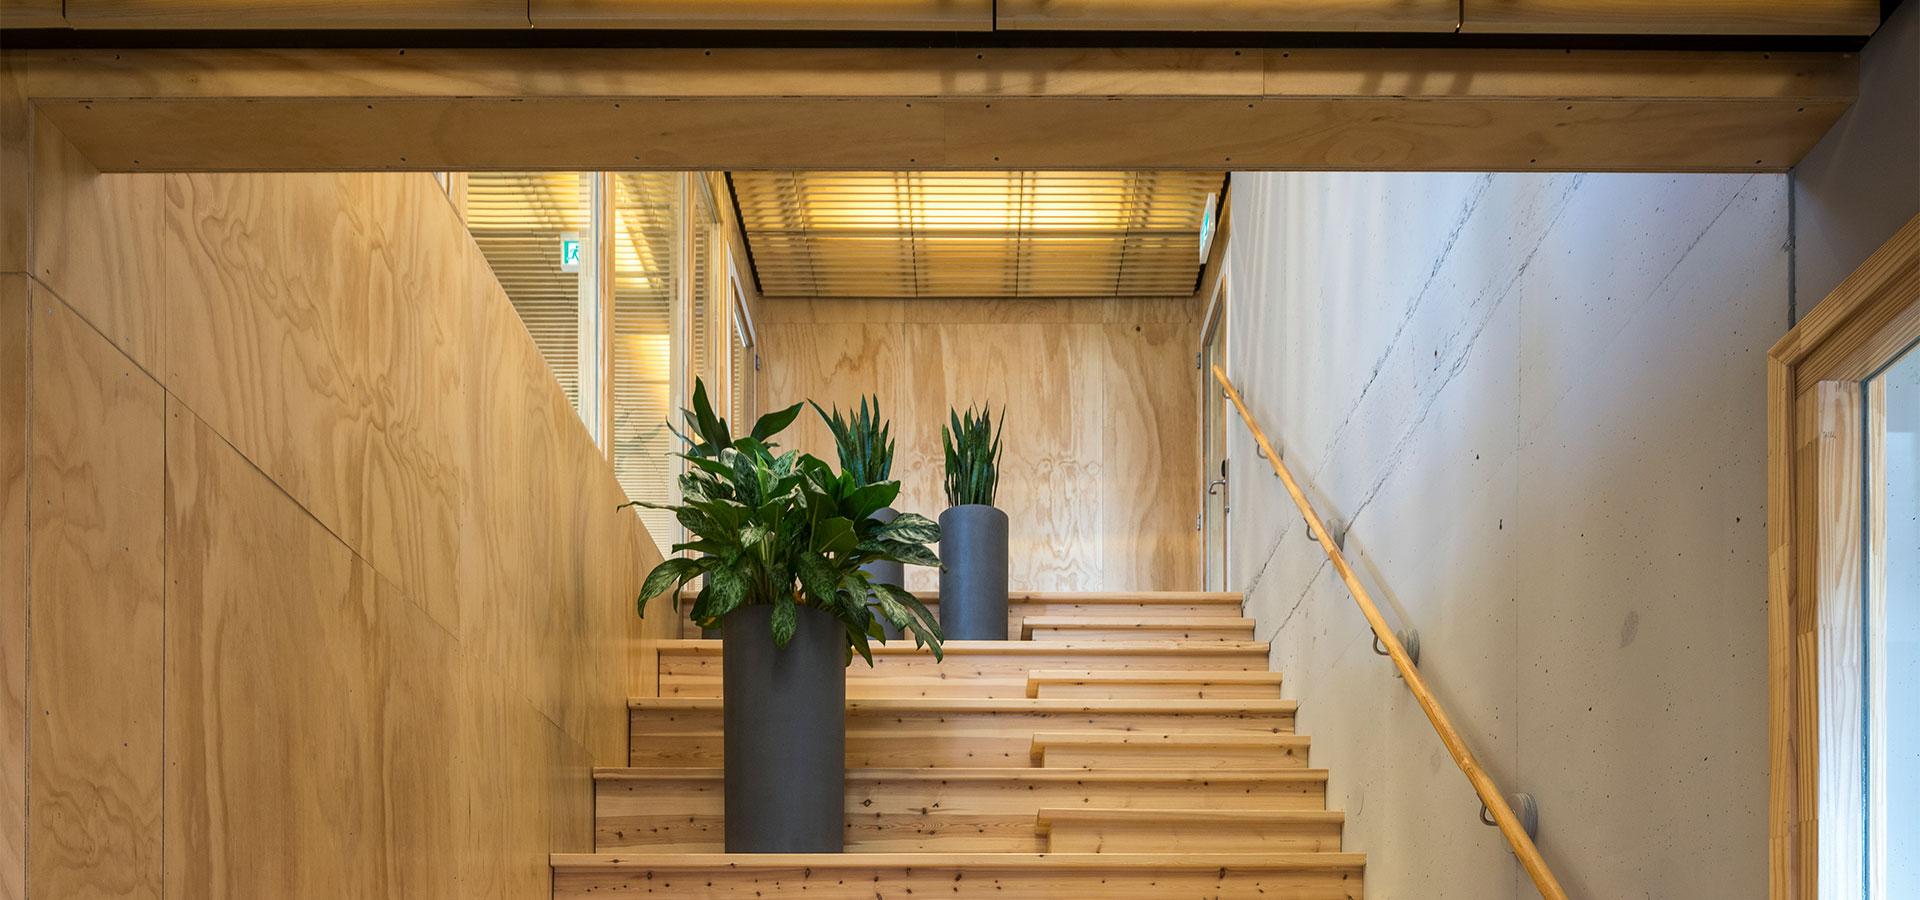 FARO architecten Oranjehuis Almere 04